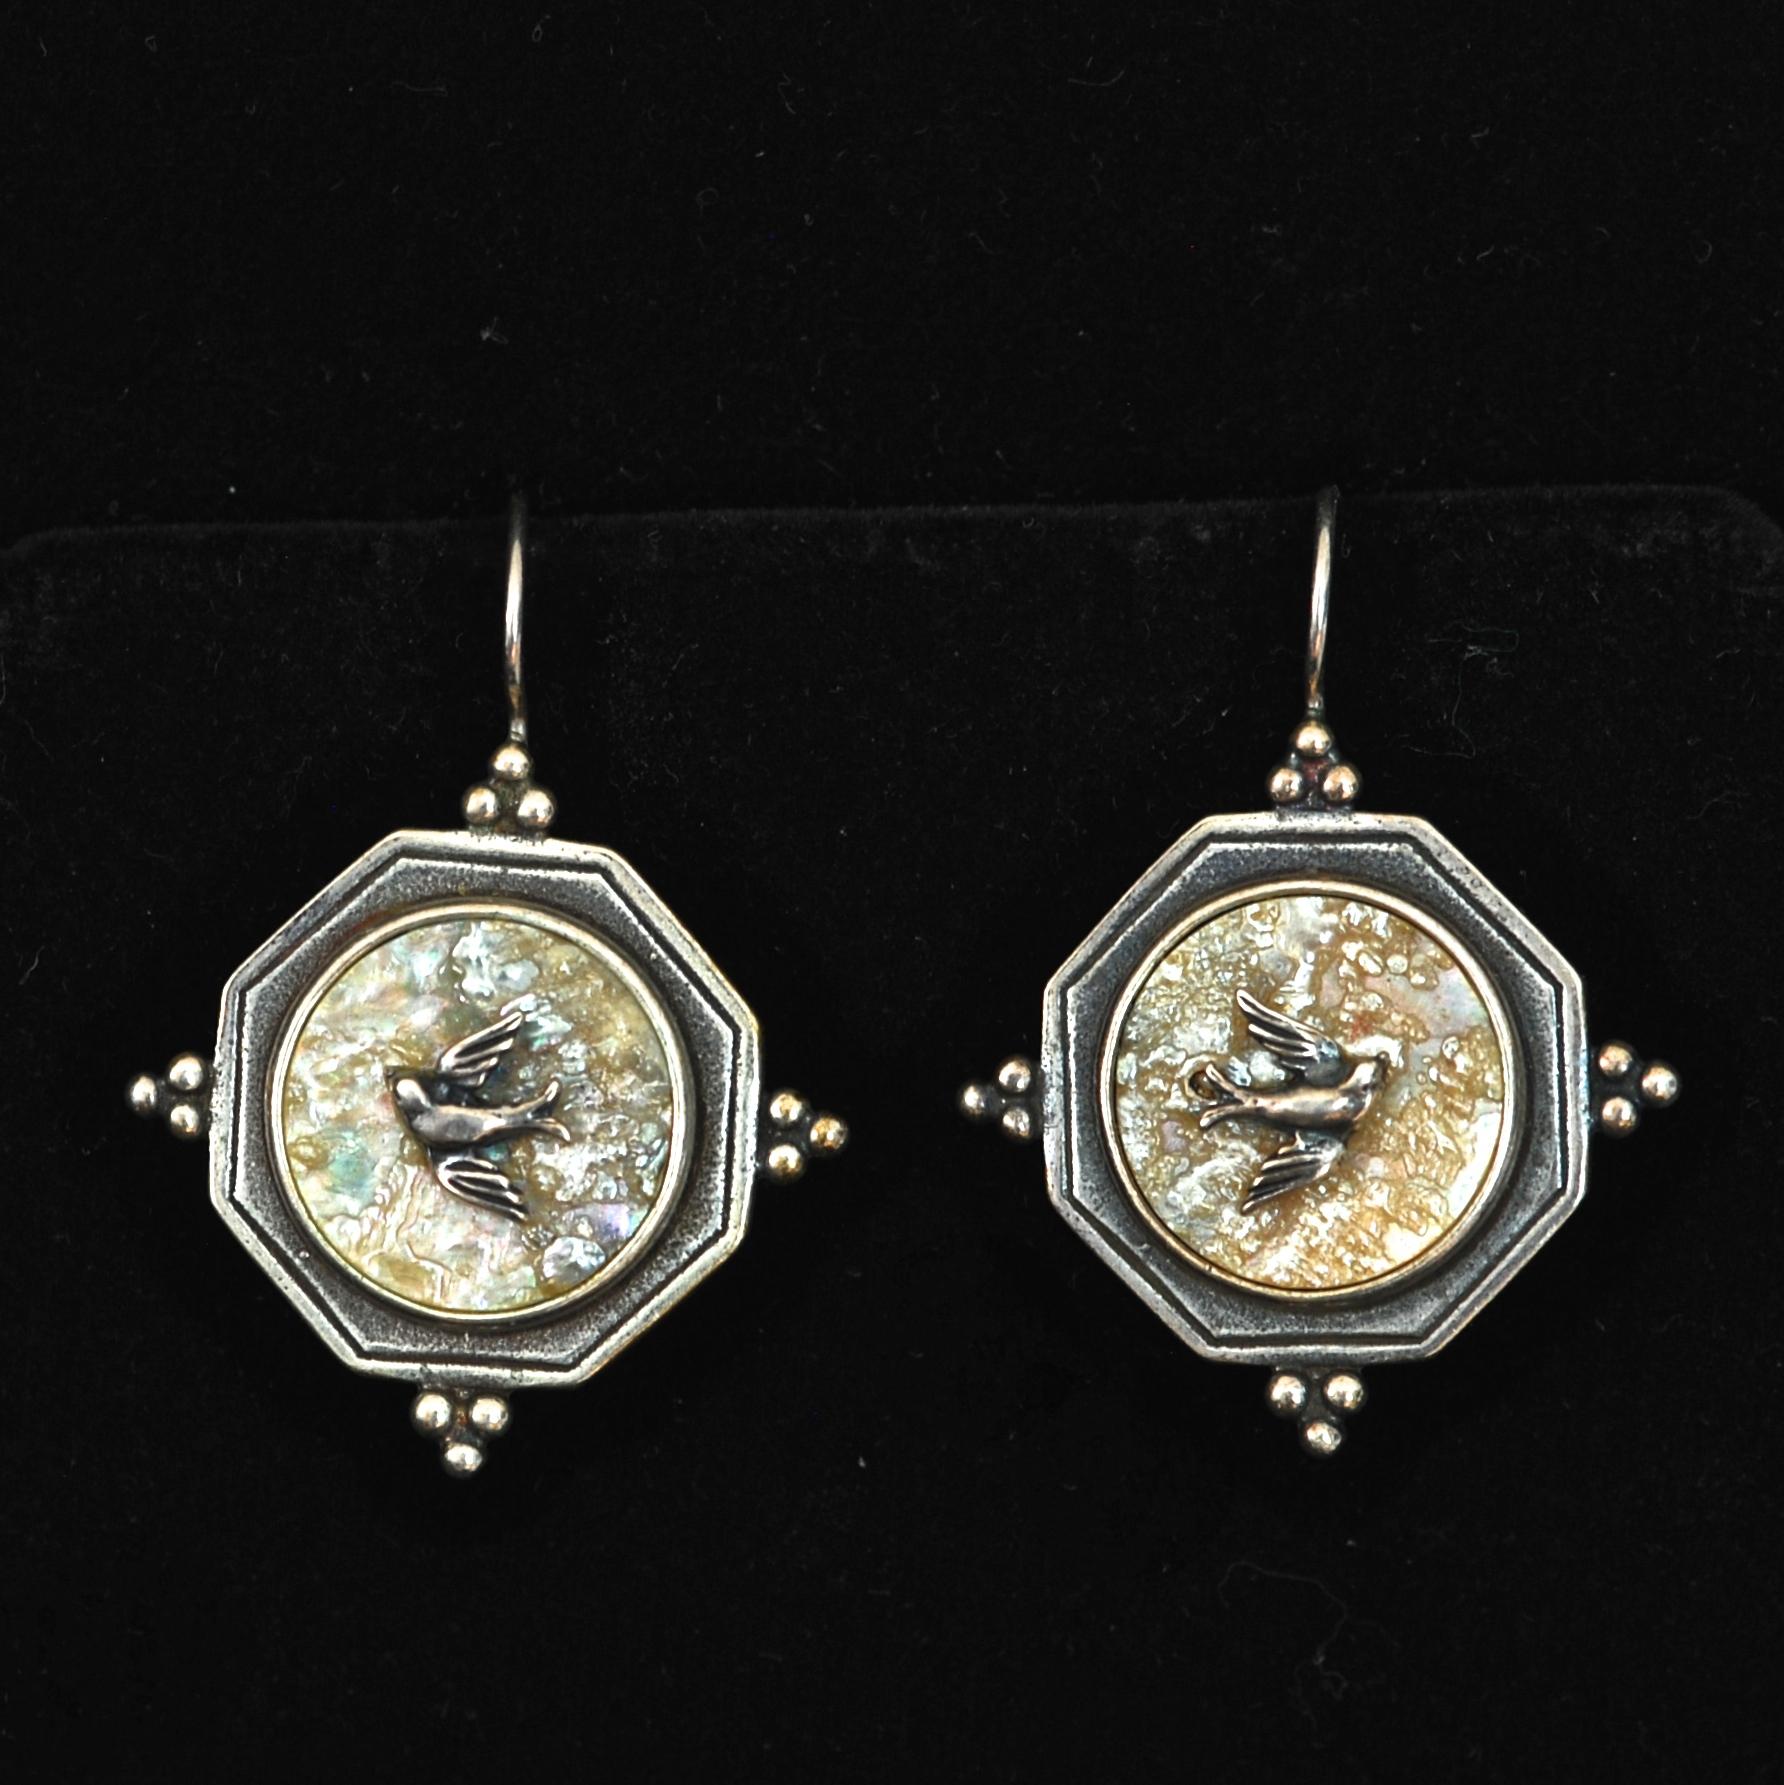 Antique Sterling Silver Earrings